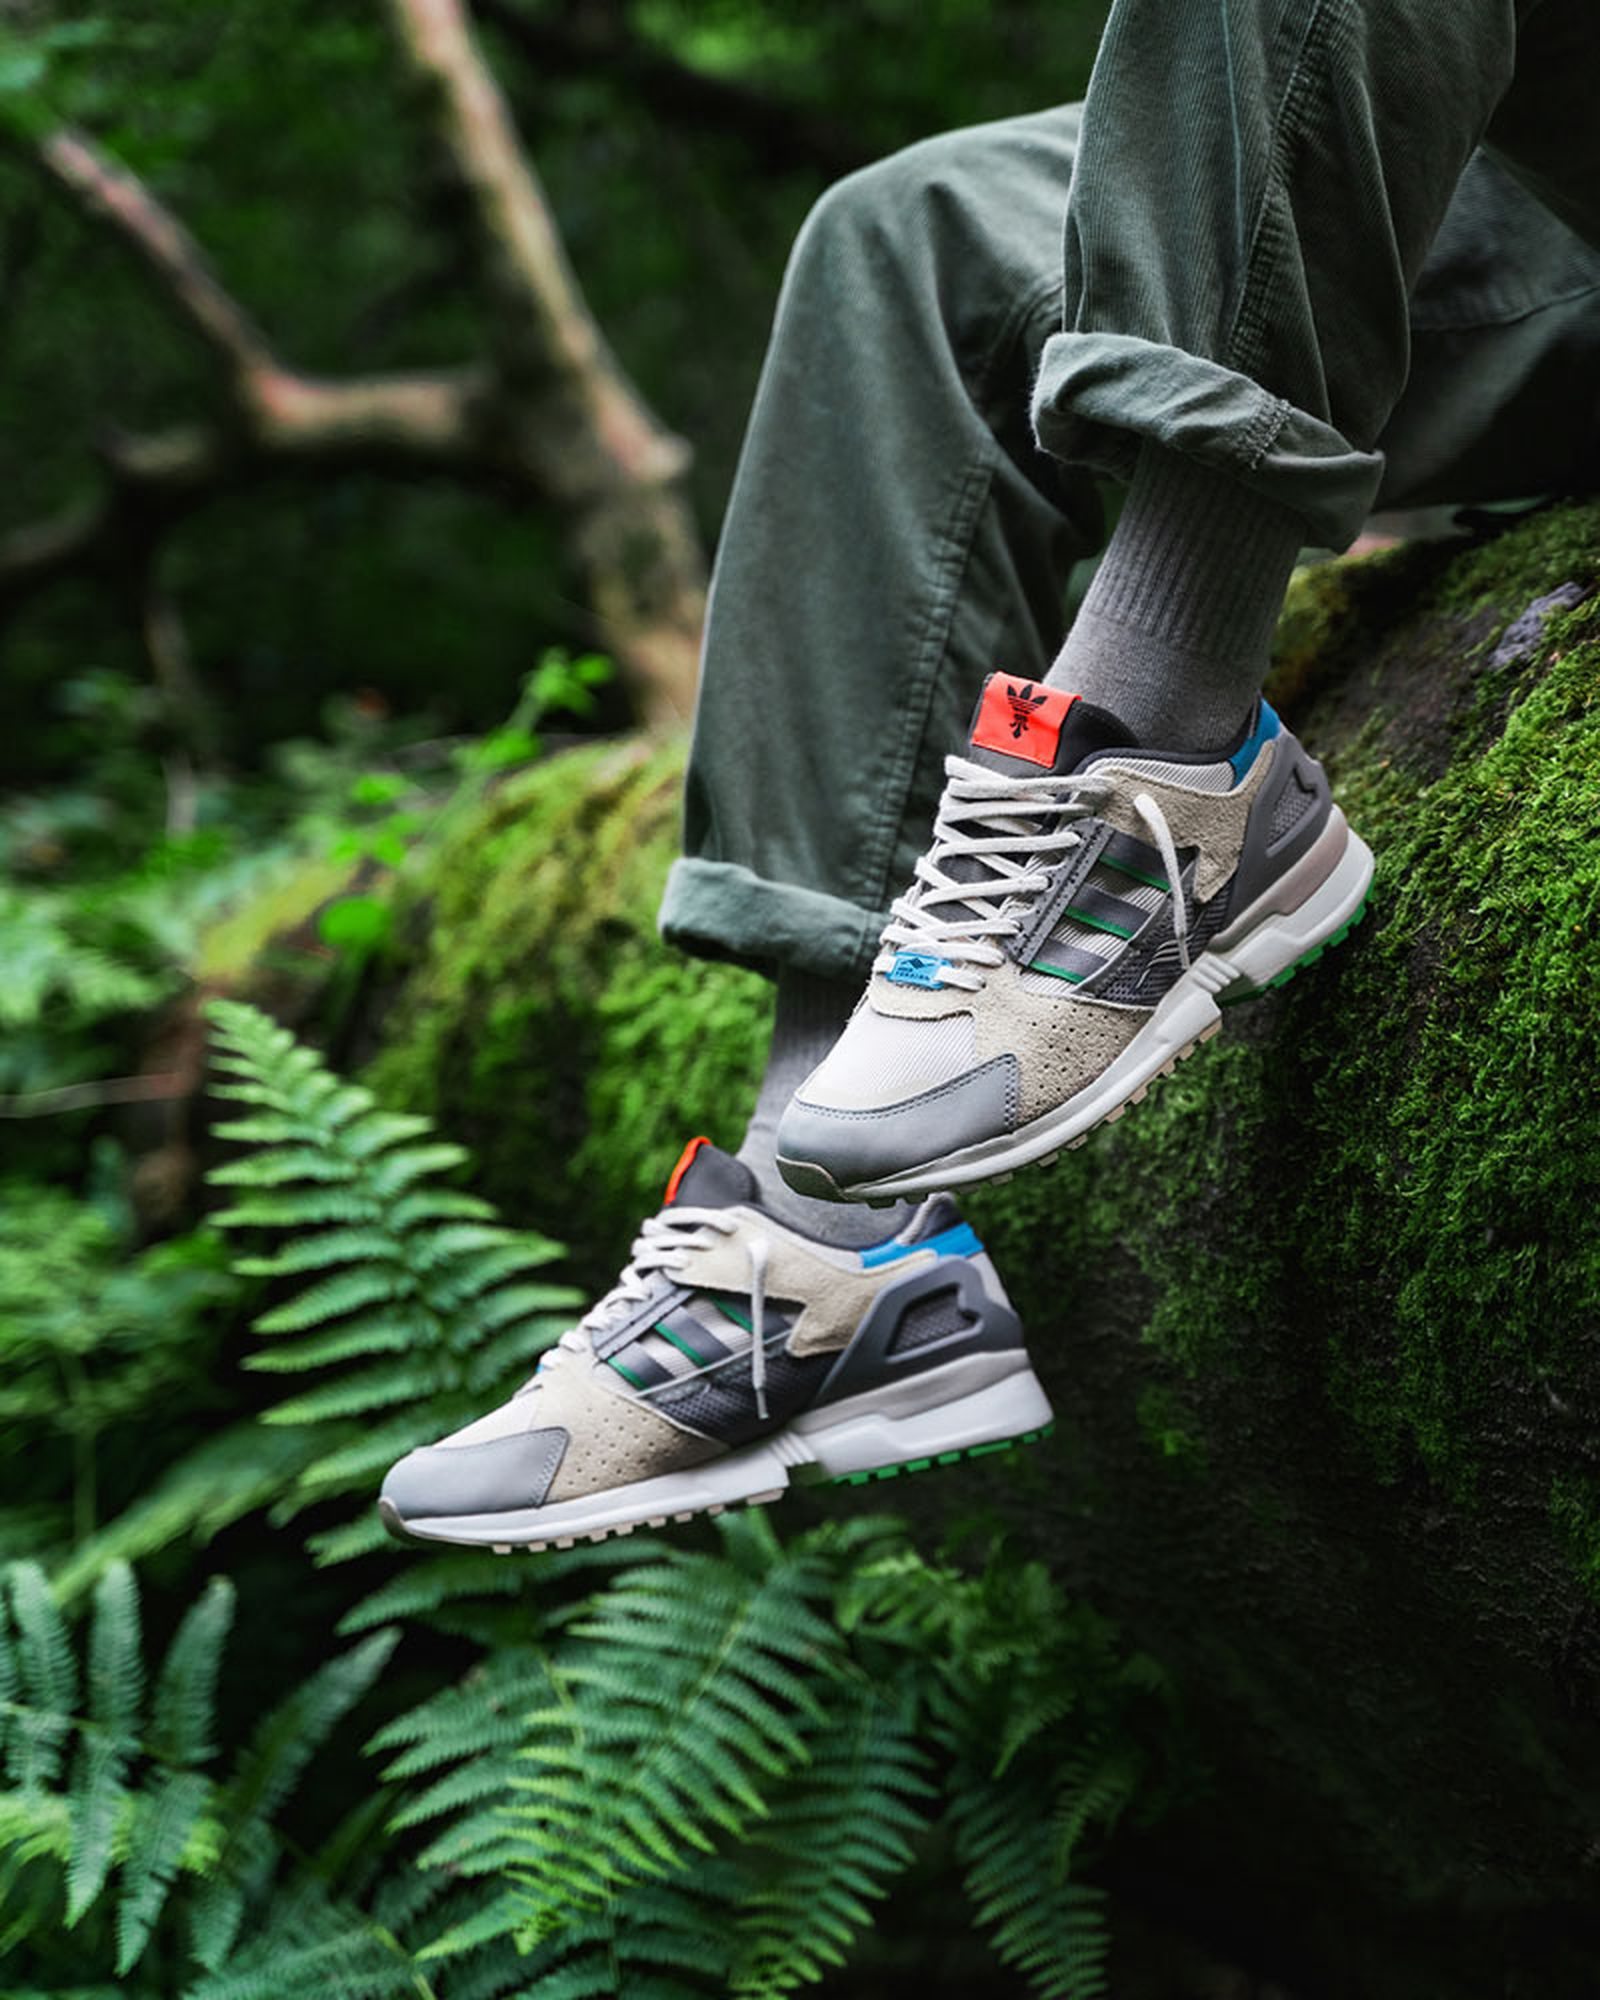 adidas-GY5108-43einhalb-Joint-Path-GREEN-4